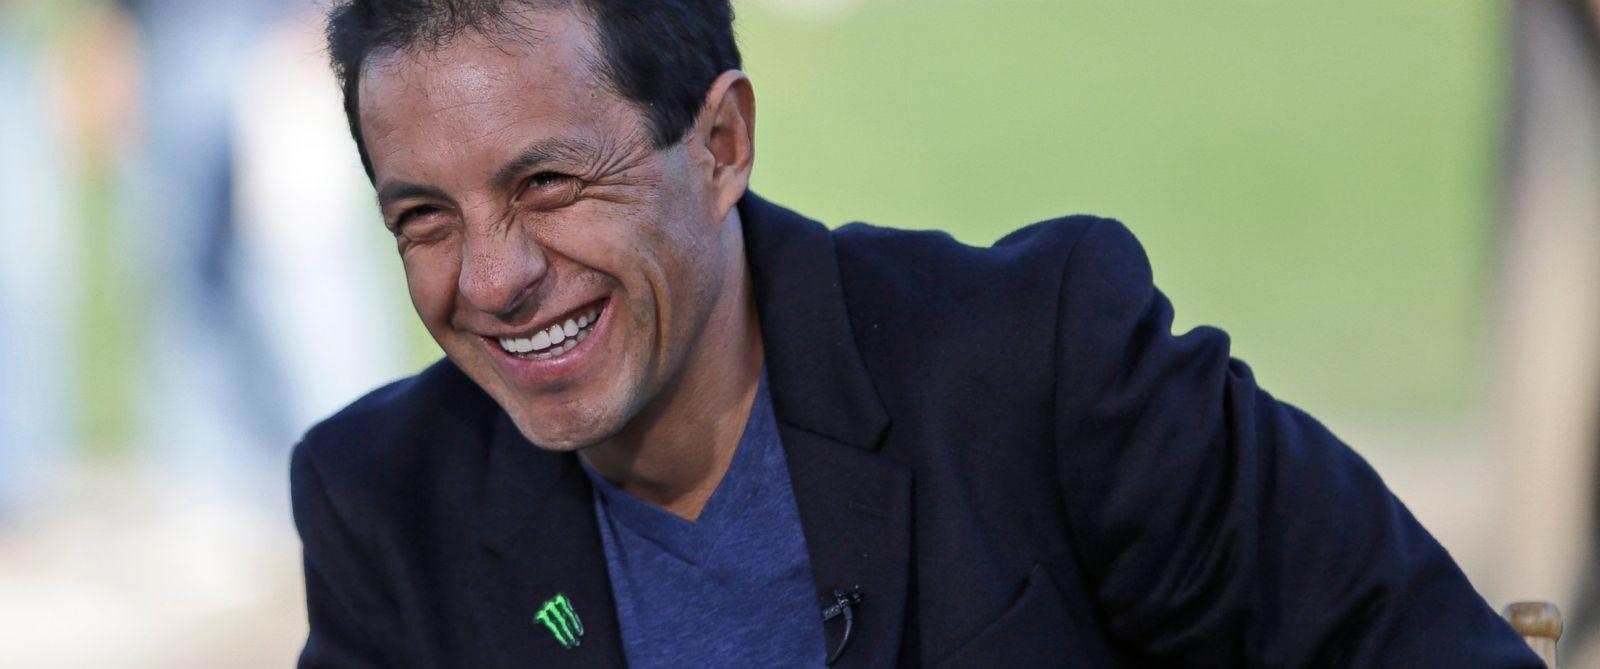 PHOTO: Jockey Victor Espinoza smiles at Belmont Park in Elmont, N.Y., Sunday, June 7, 2015.